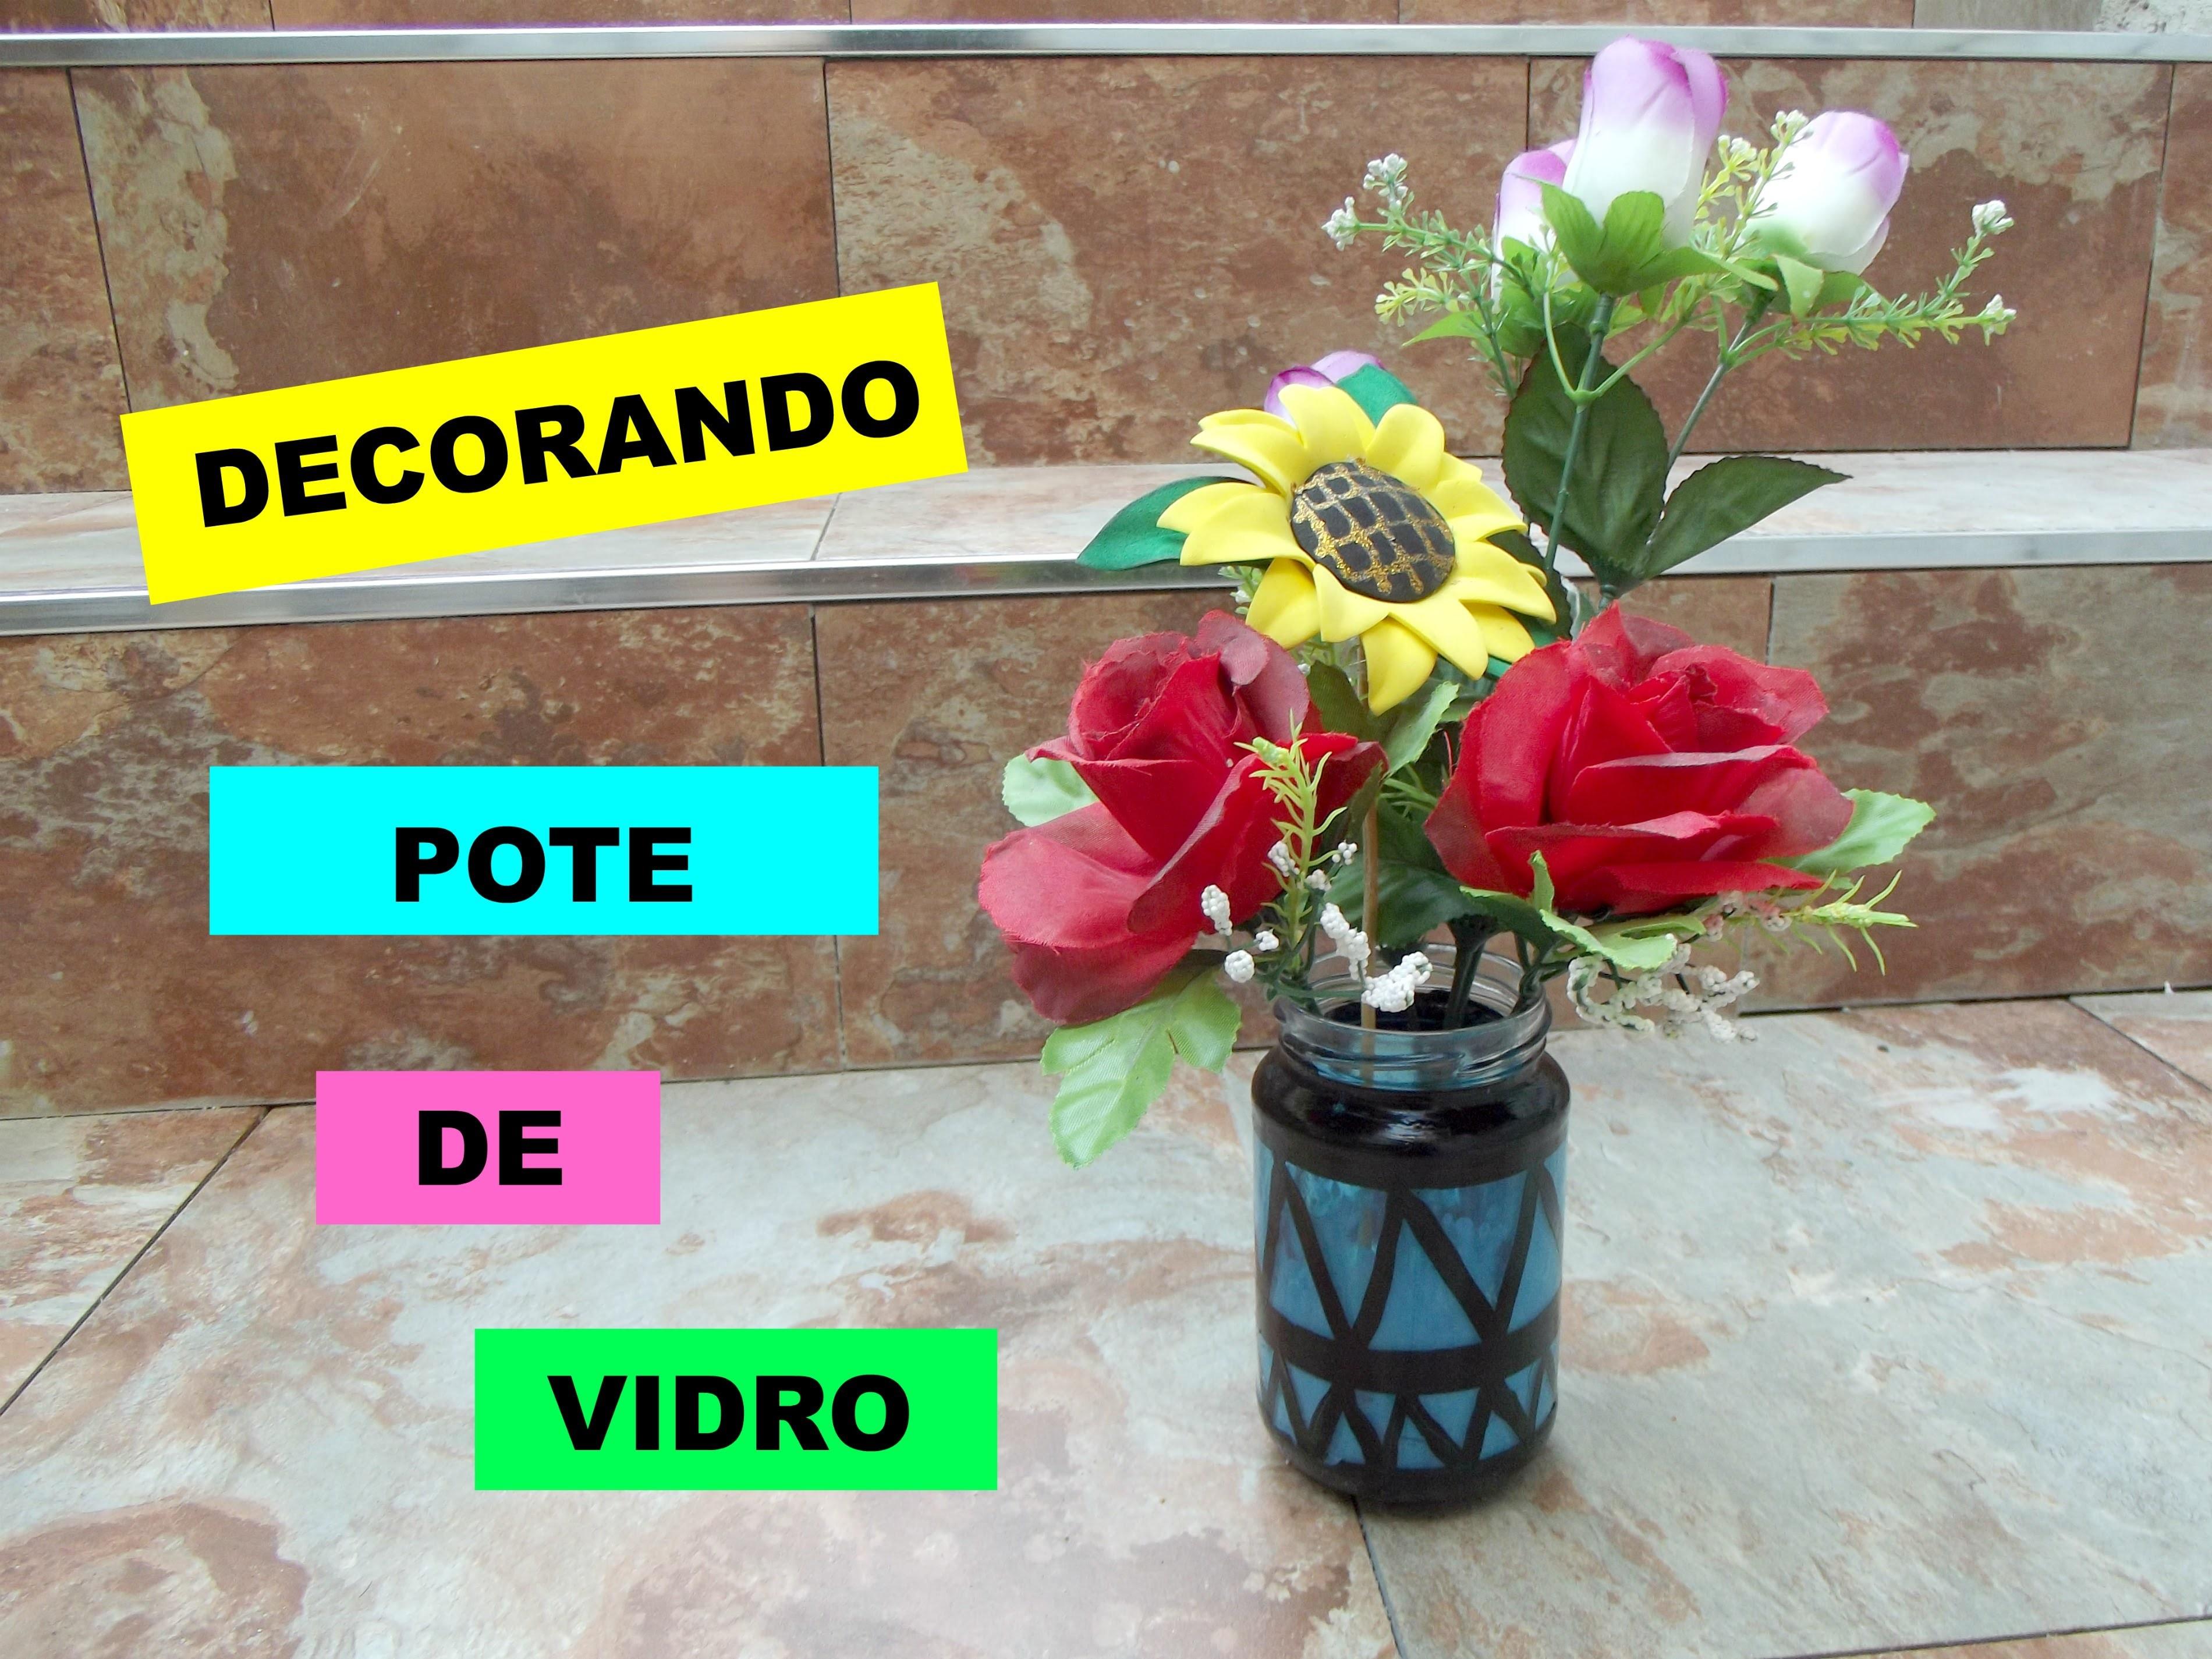 DIY: Decorando pote de vidro. Decorating glass jar ❤